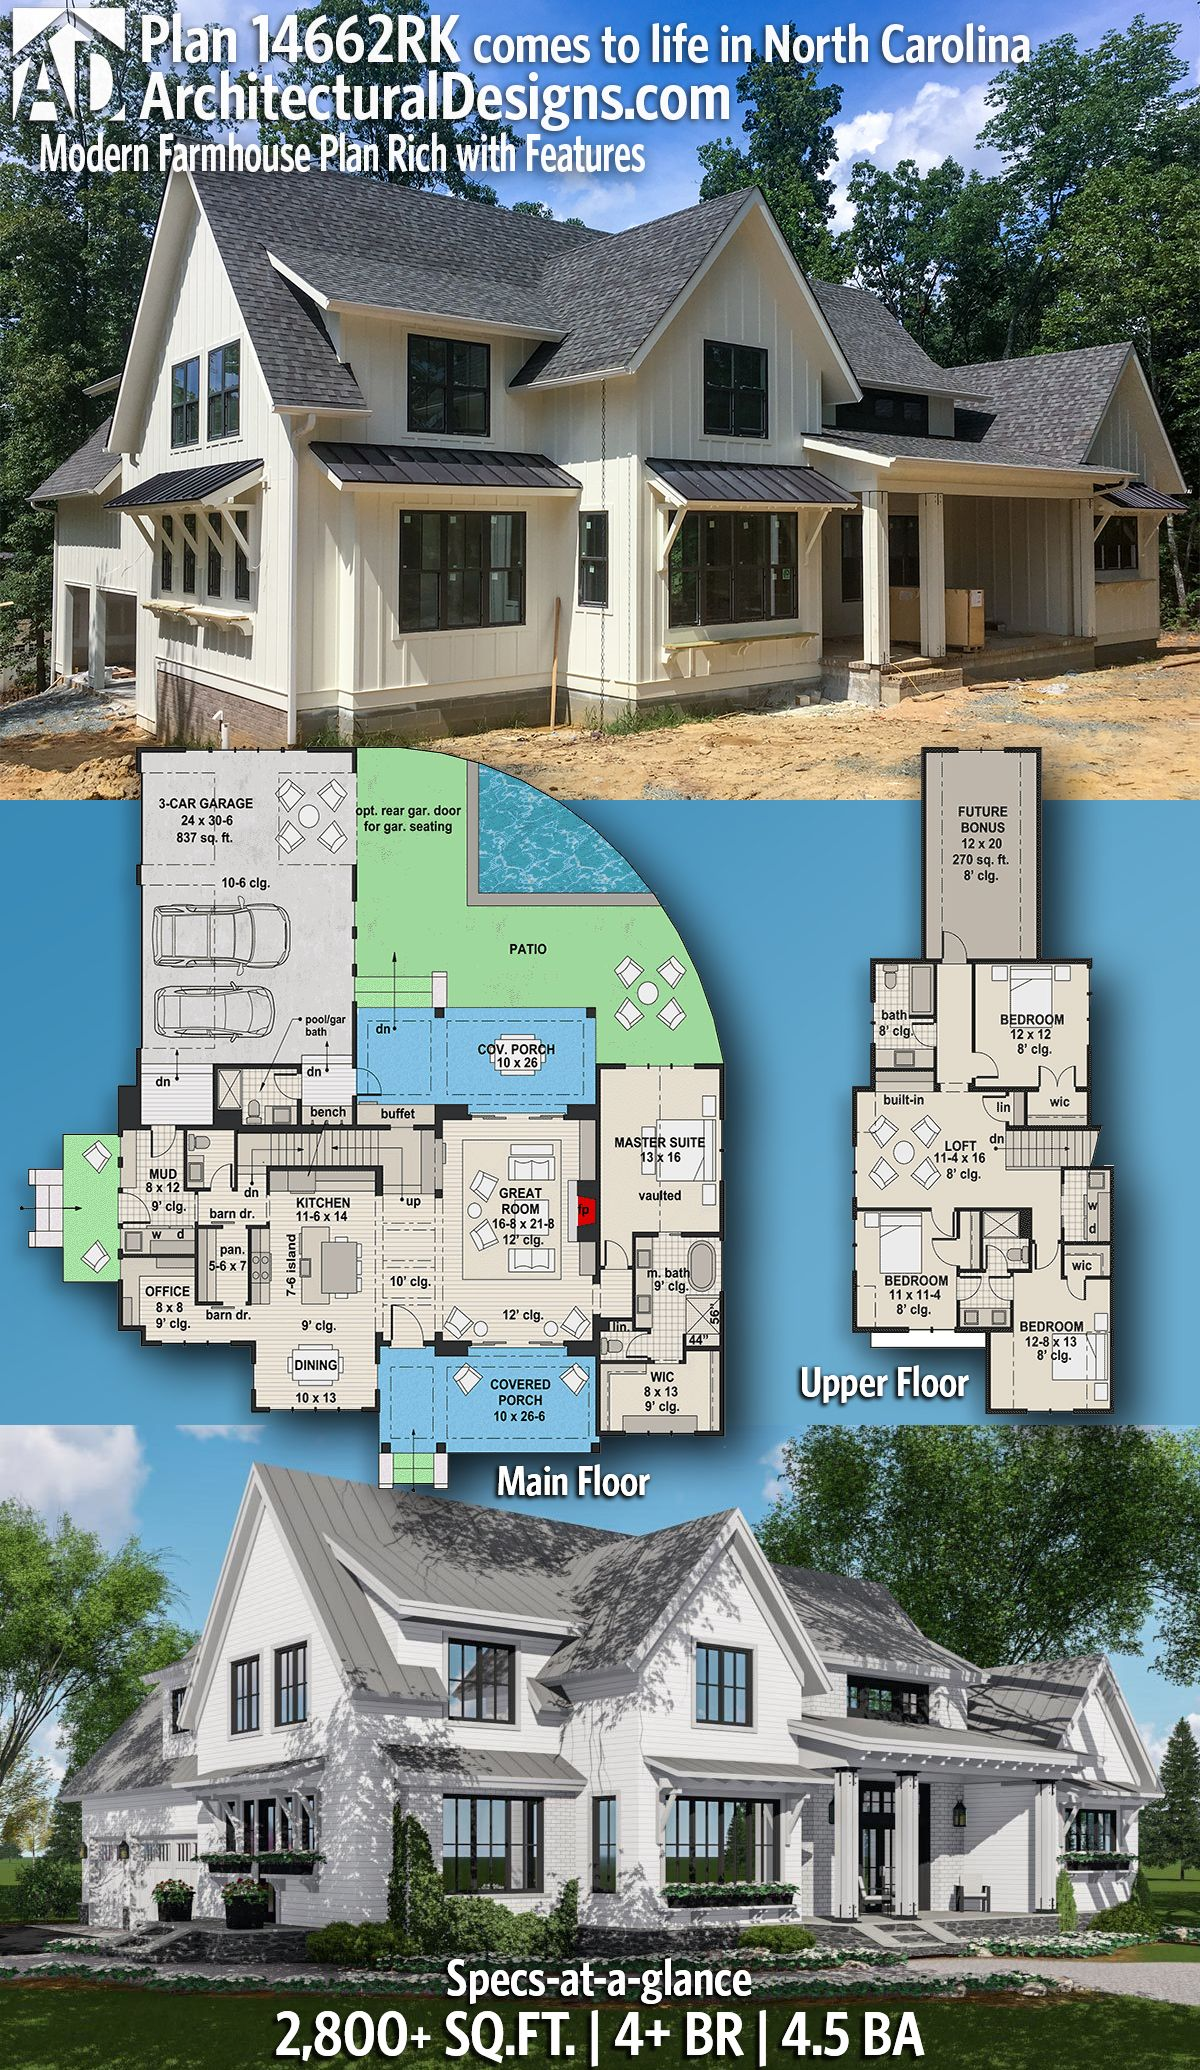 Architectural Designs Modern Farmhouse Plan 14662RK client built